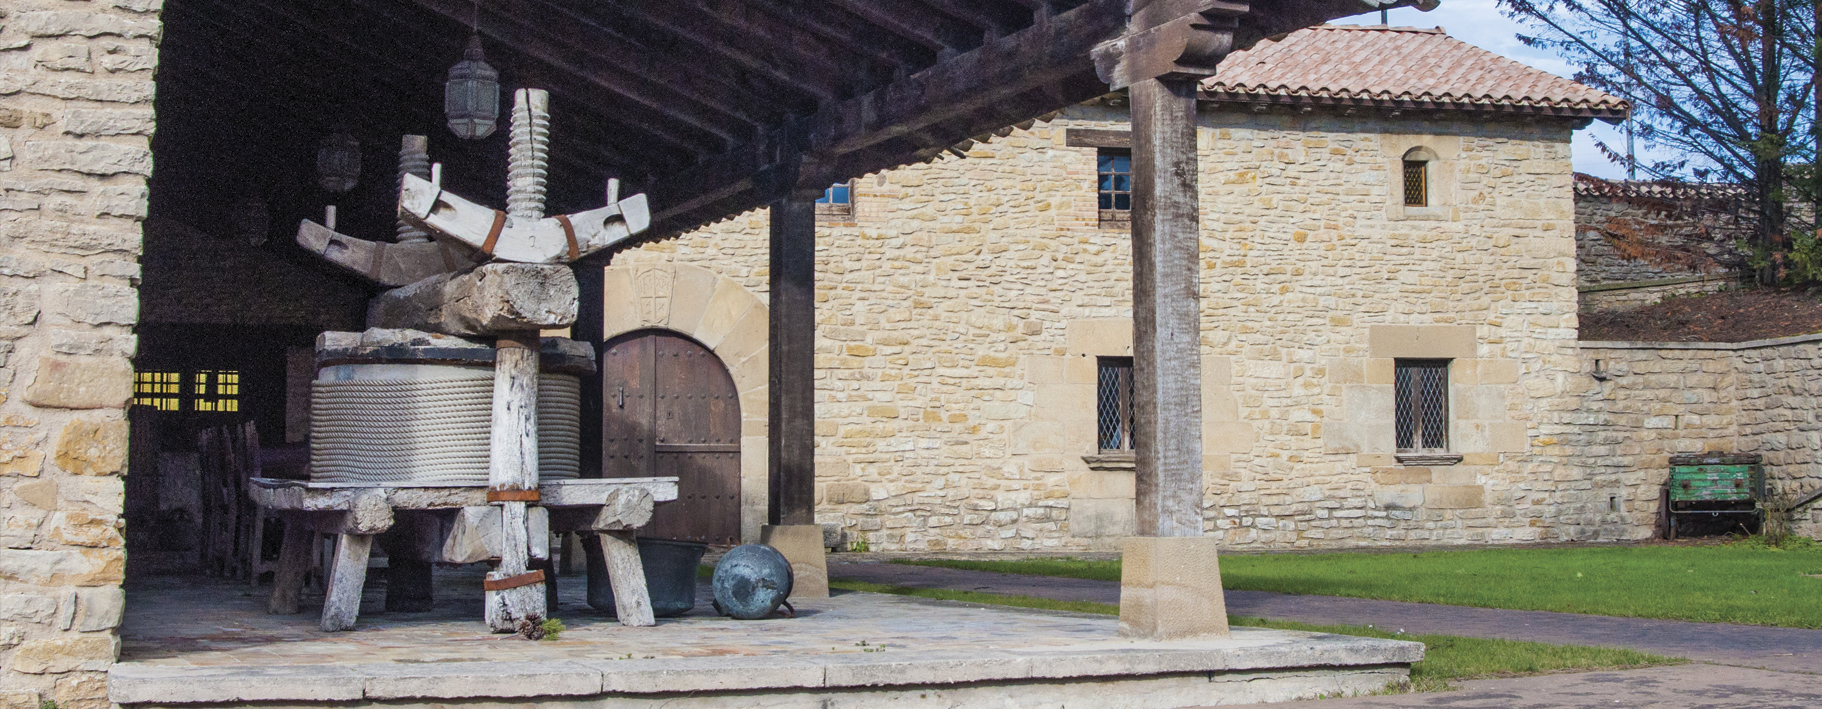 bodegas-manzanos-campanas014